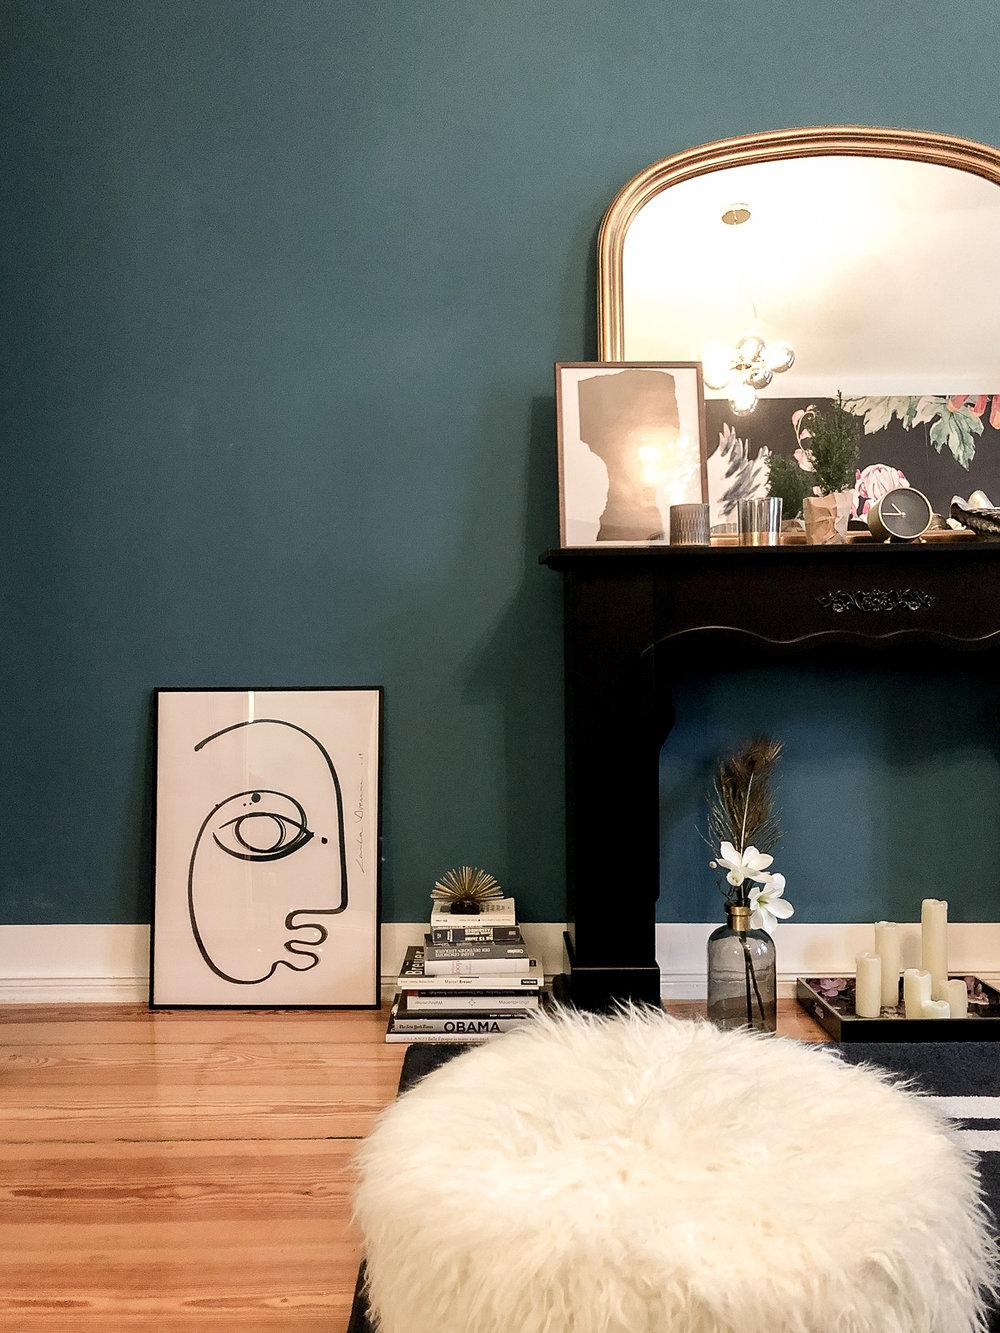 e design_room makeover 01.jpg